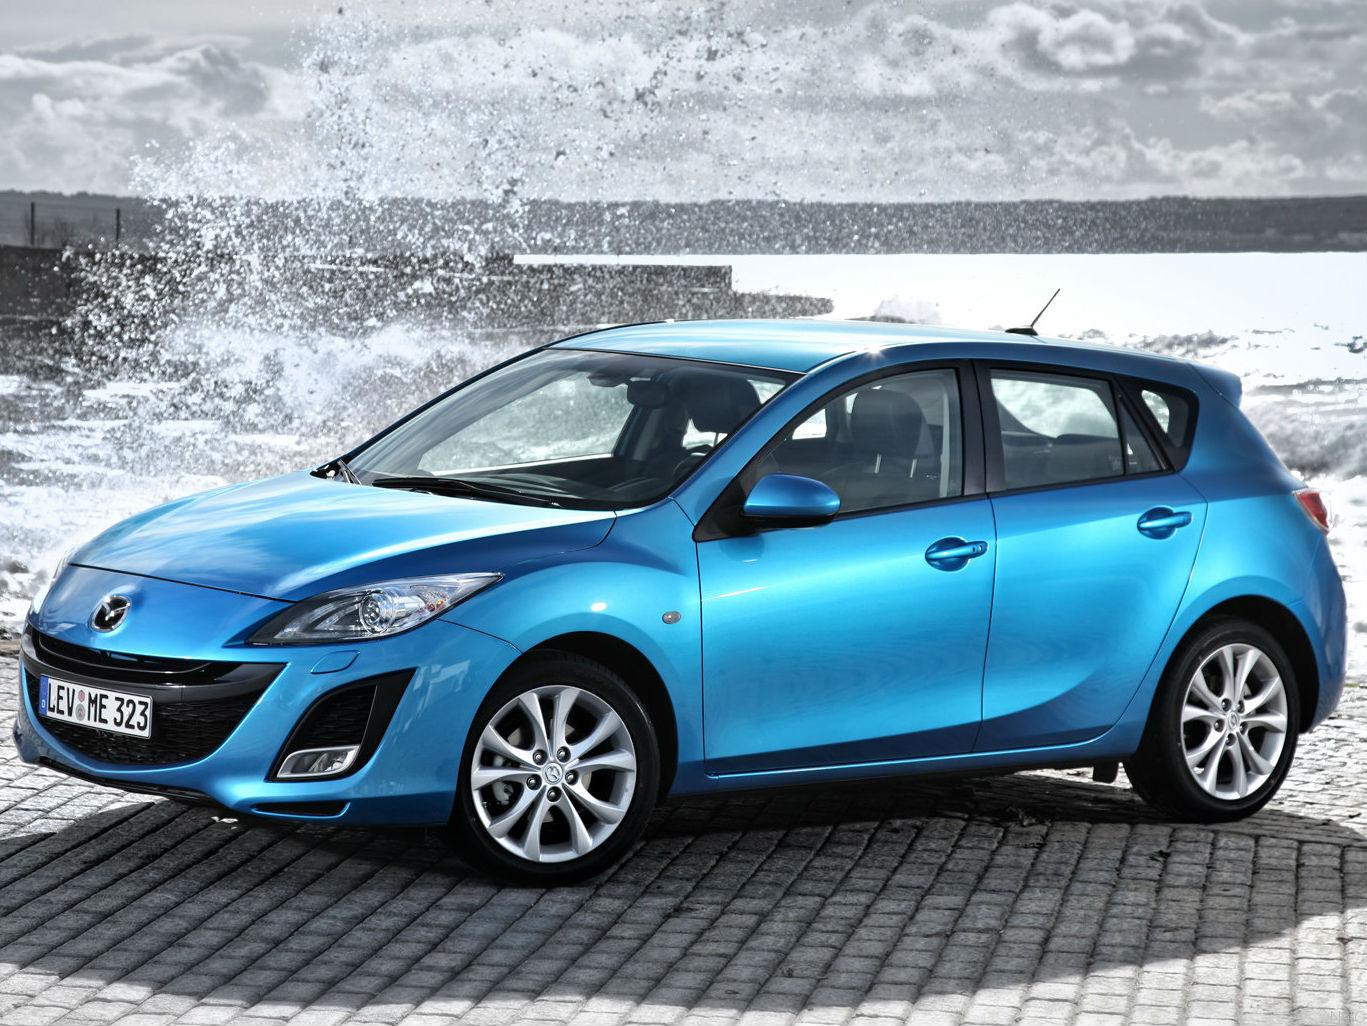 2008 Mazda 3 Battery